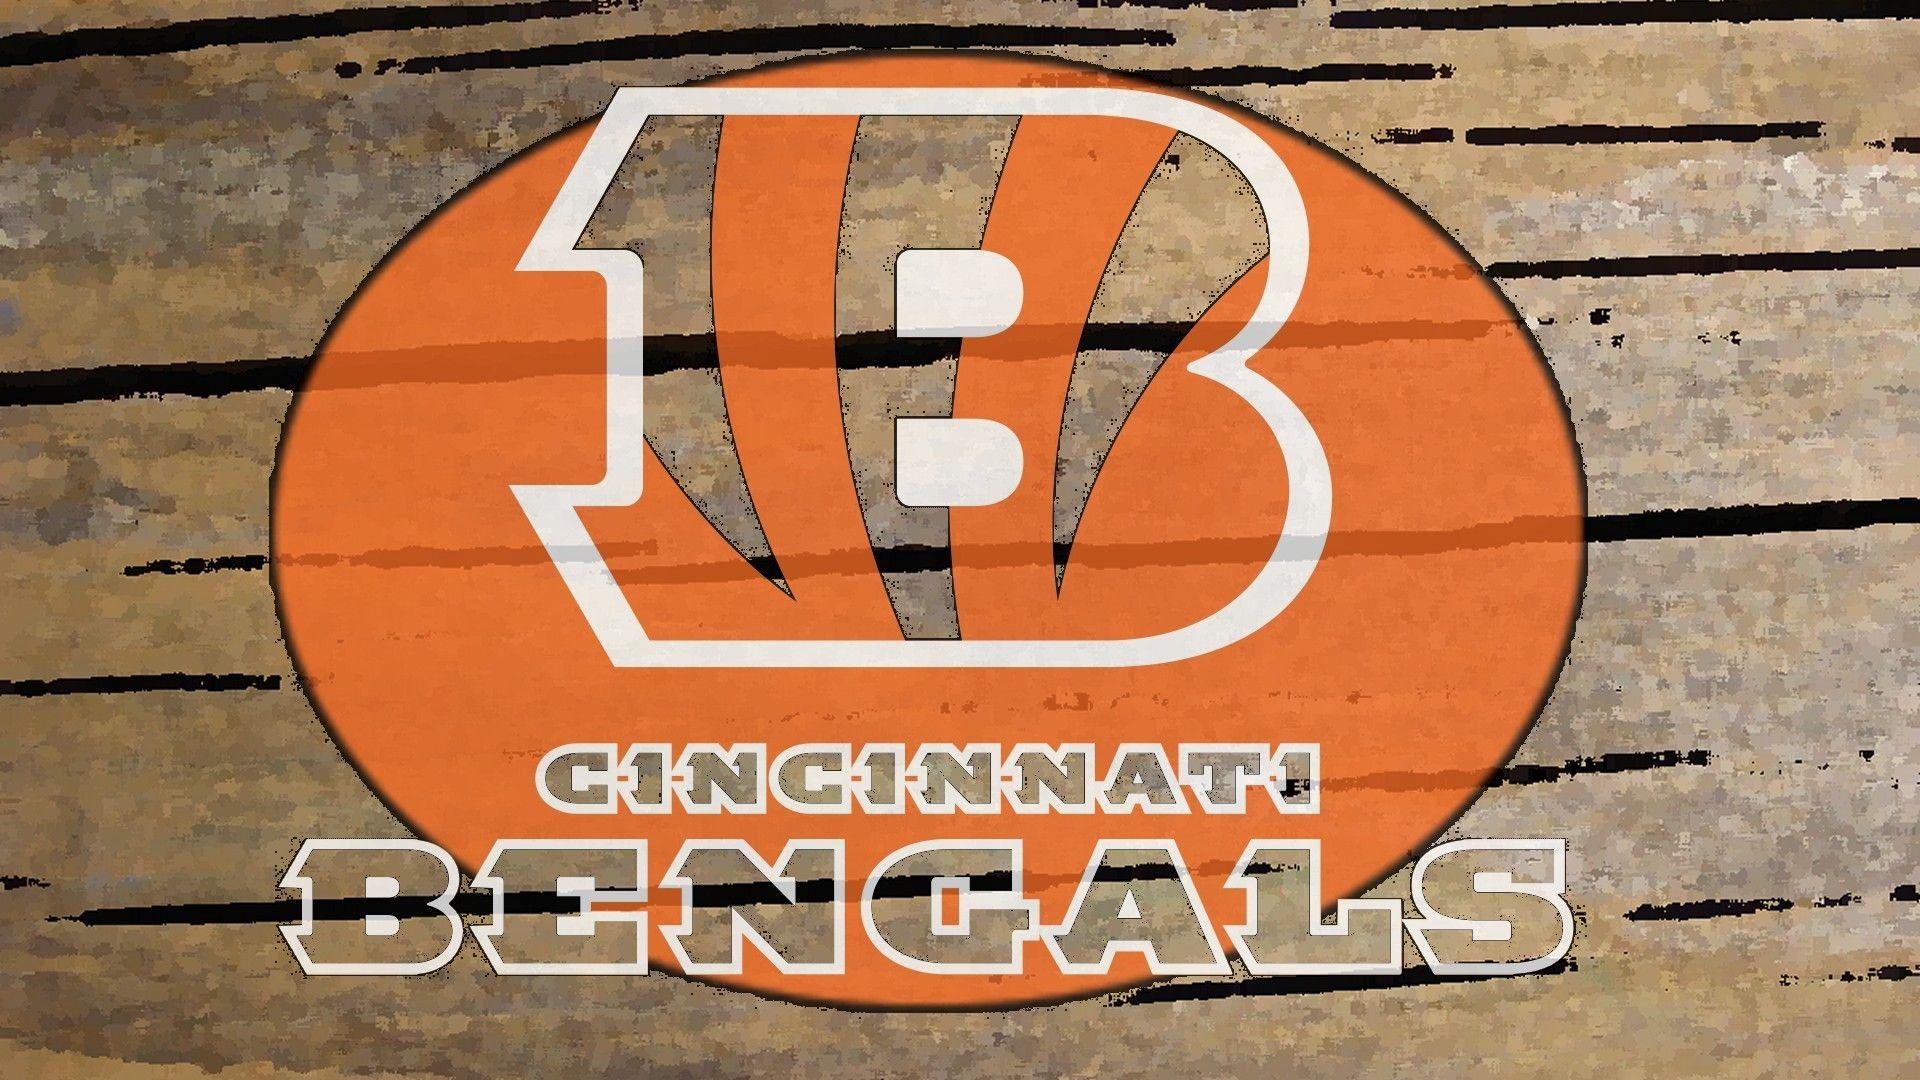 Cincinnati Bengals Hd Wallpaper Download